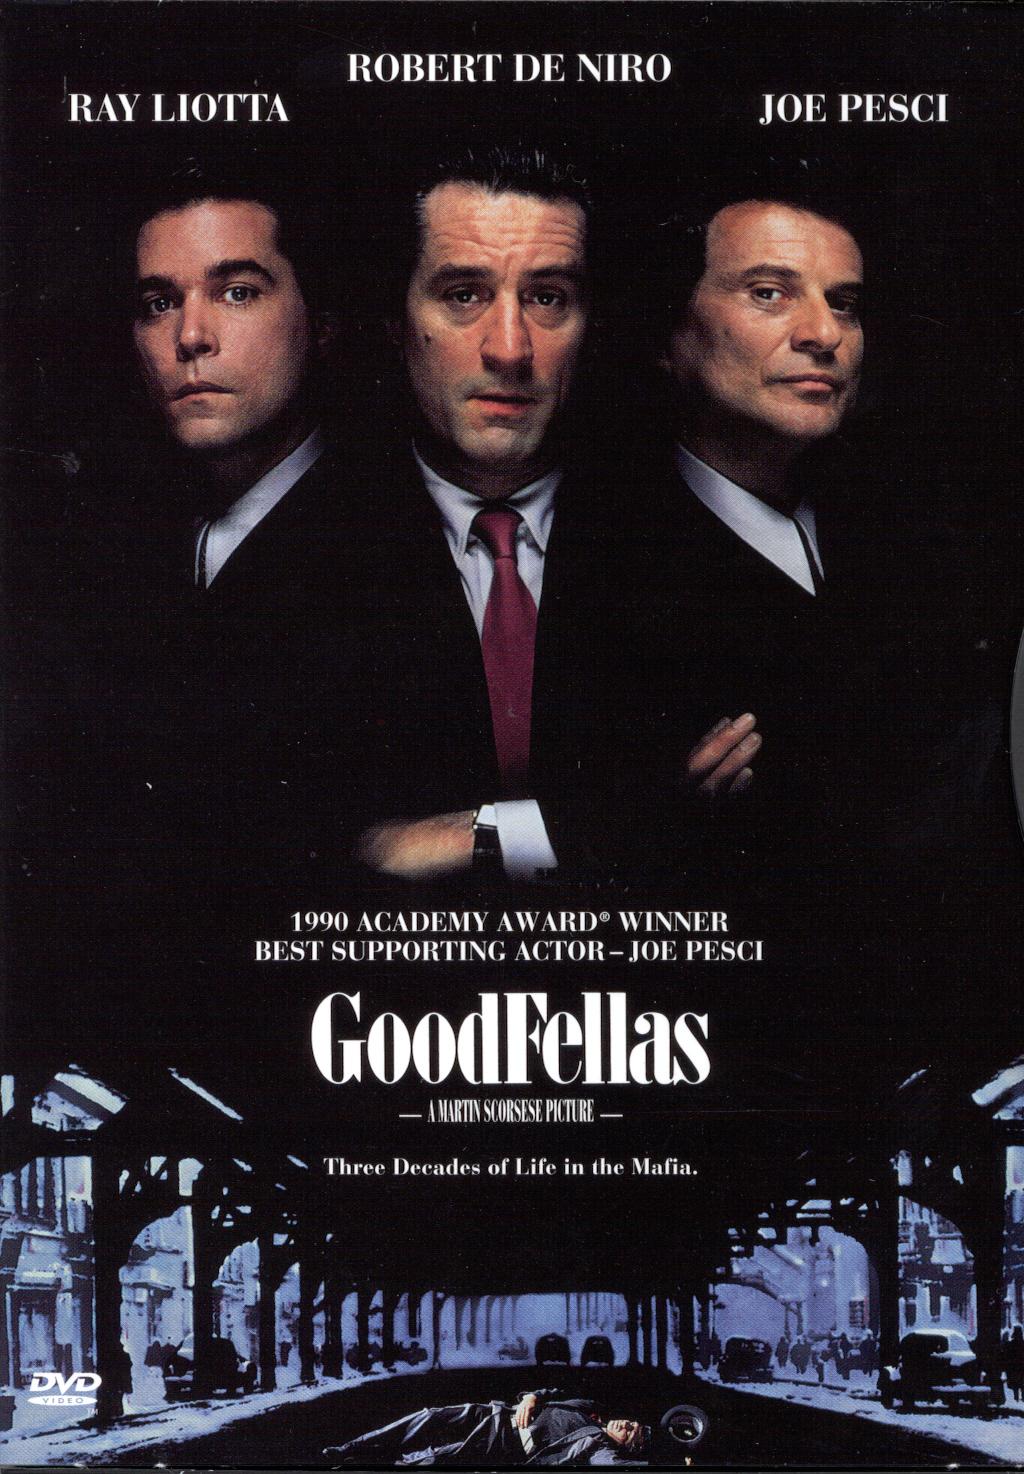 Goodfellas Film